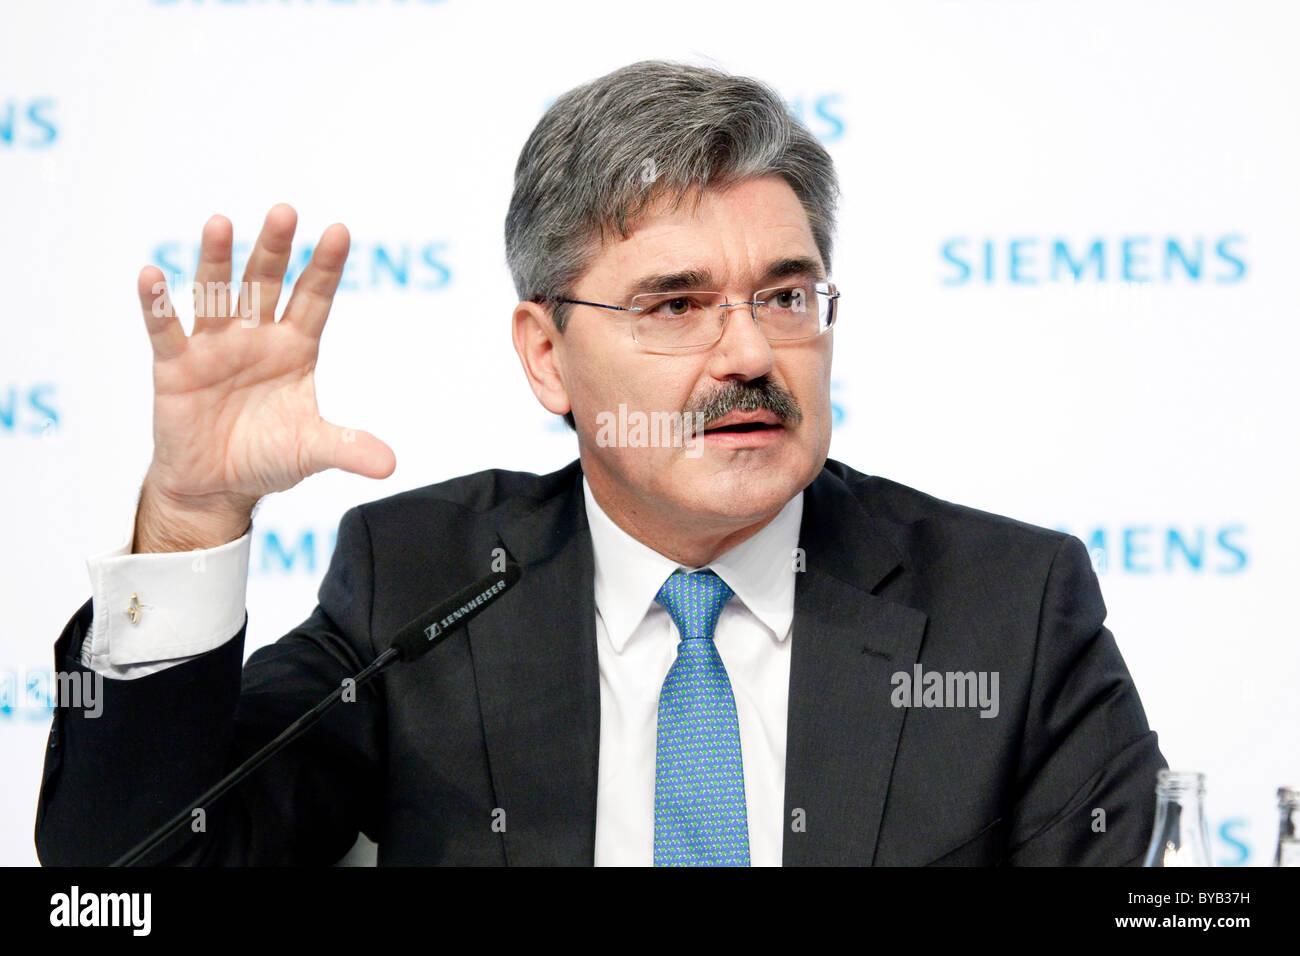 Jo Kaeser, Chief Financial Officer der Siemens AG, während der Pressekonferenz am Jahresabschluss am 11.11.2010 Stockbild